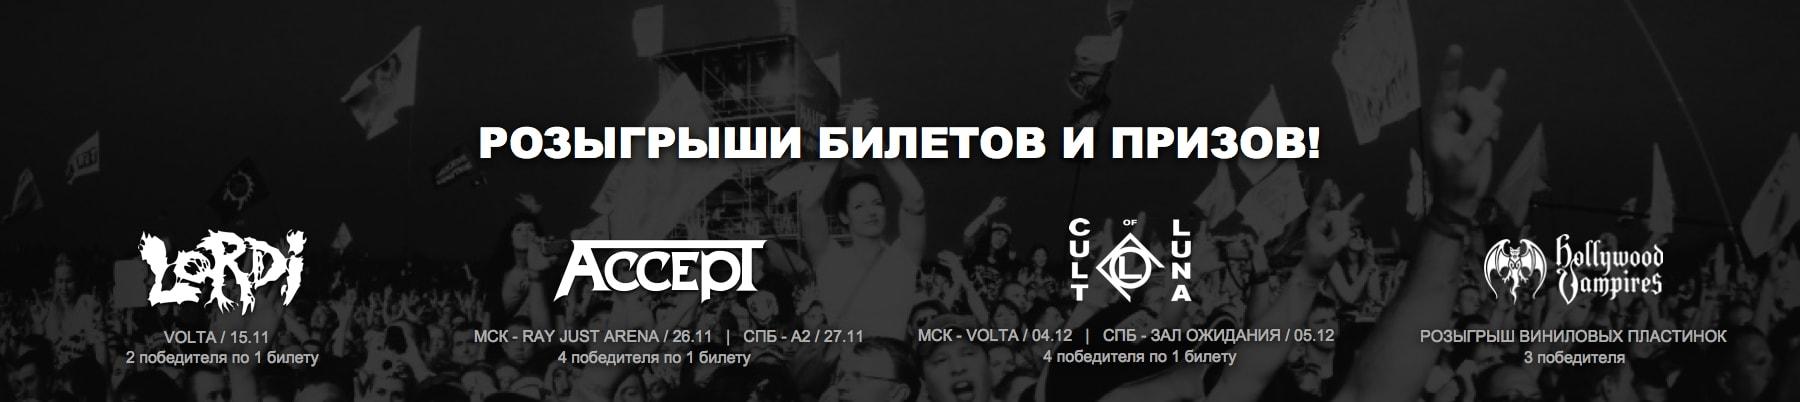 Розыгрыш билетов на концерты